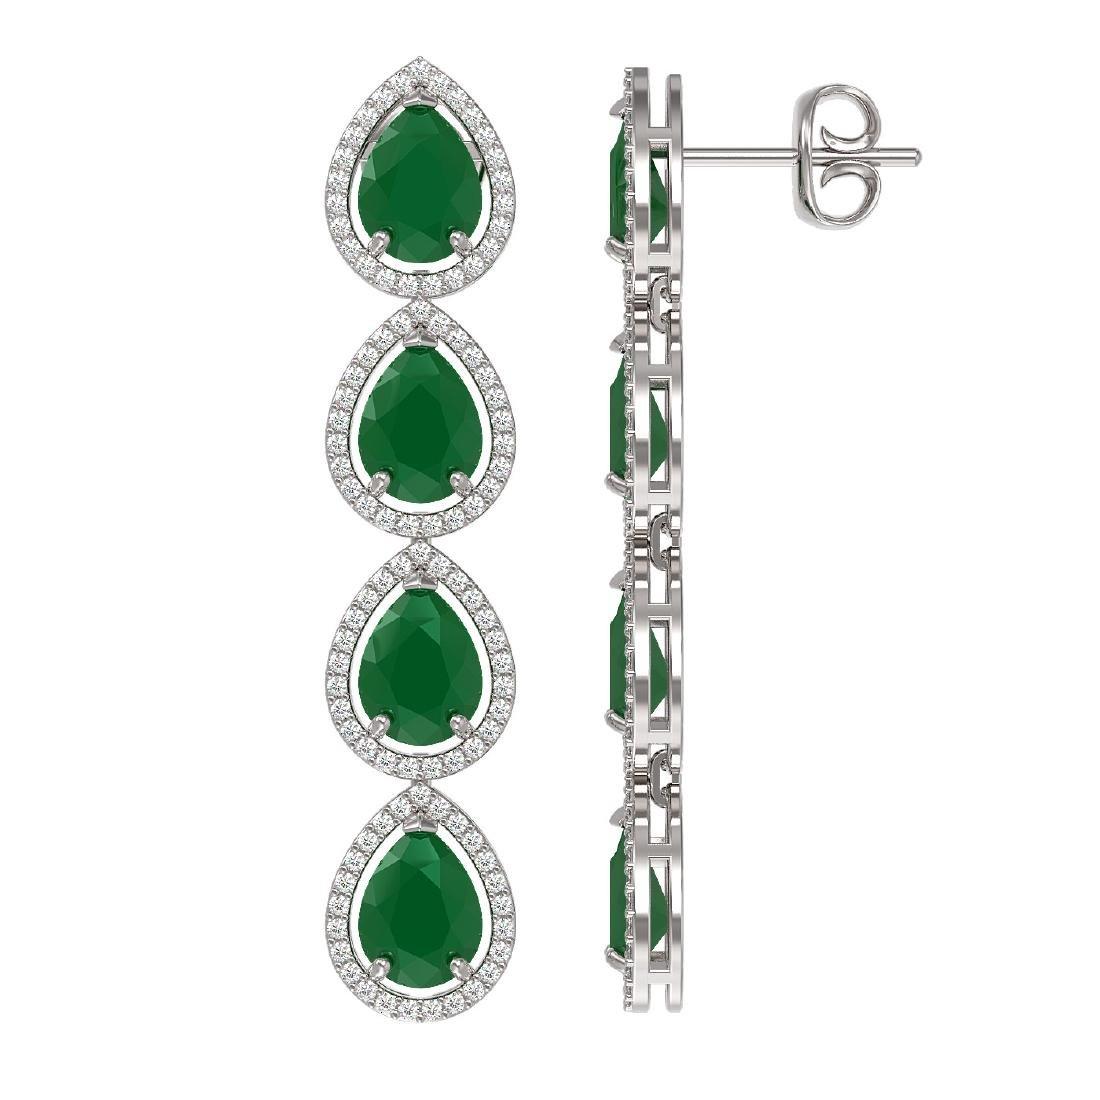 16.01 CTW Emerald & Diamond Halo Earrings 10K White - 2